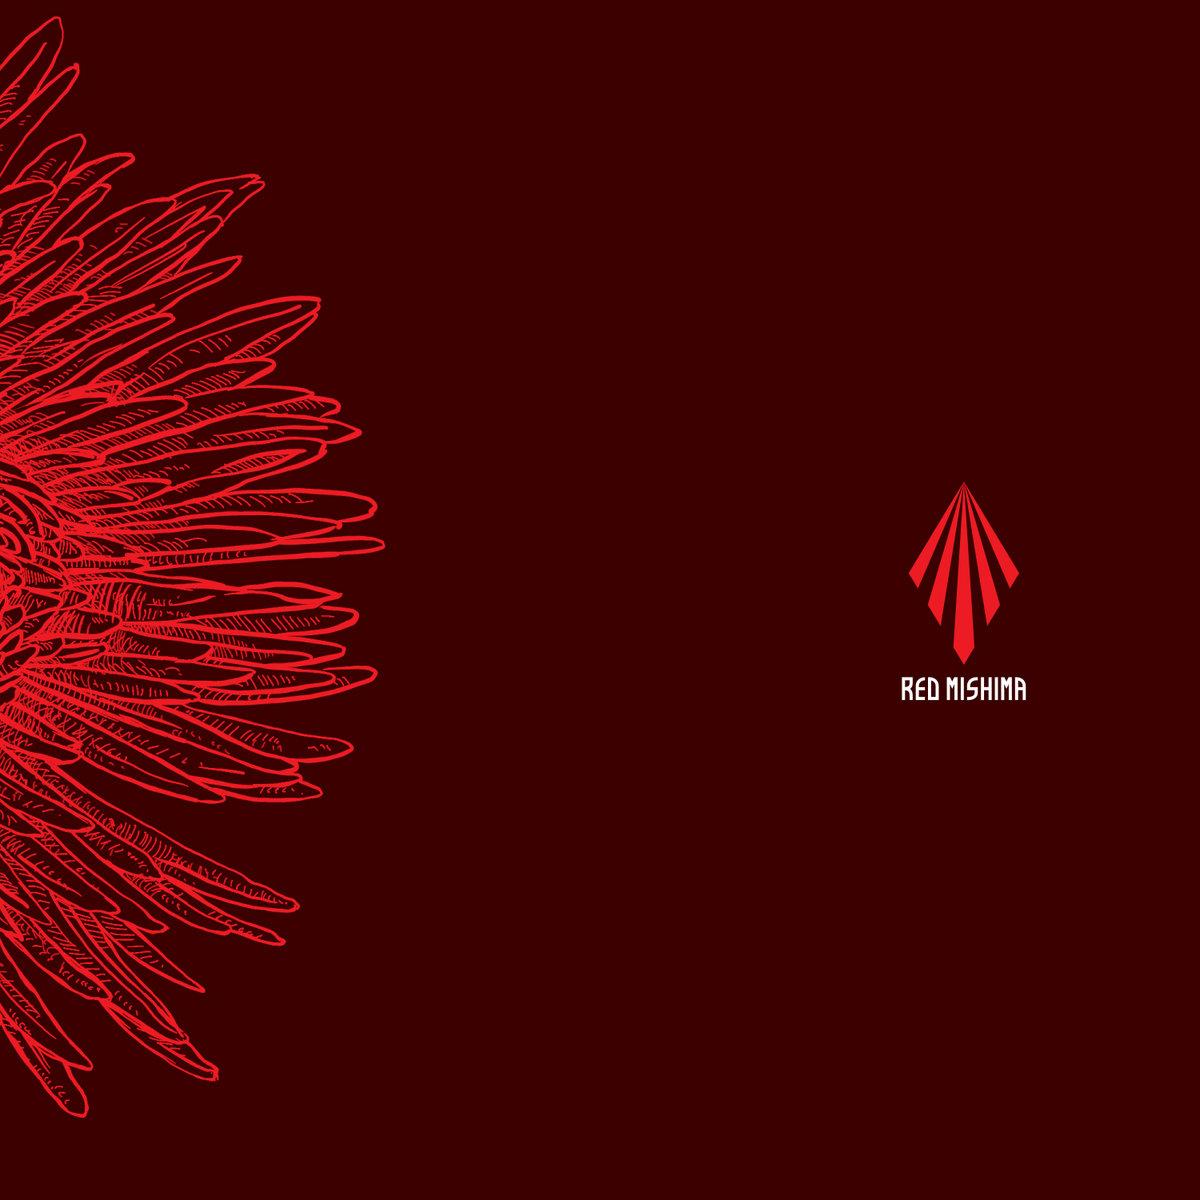 Red Mishima – Red Mishima (2020) [FLAC]